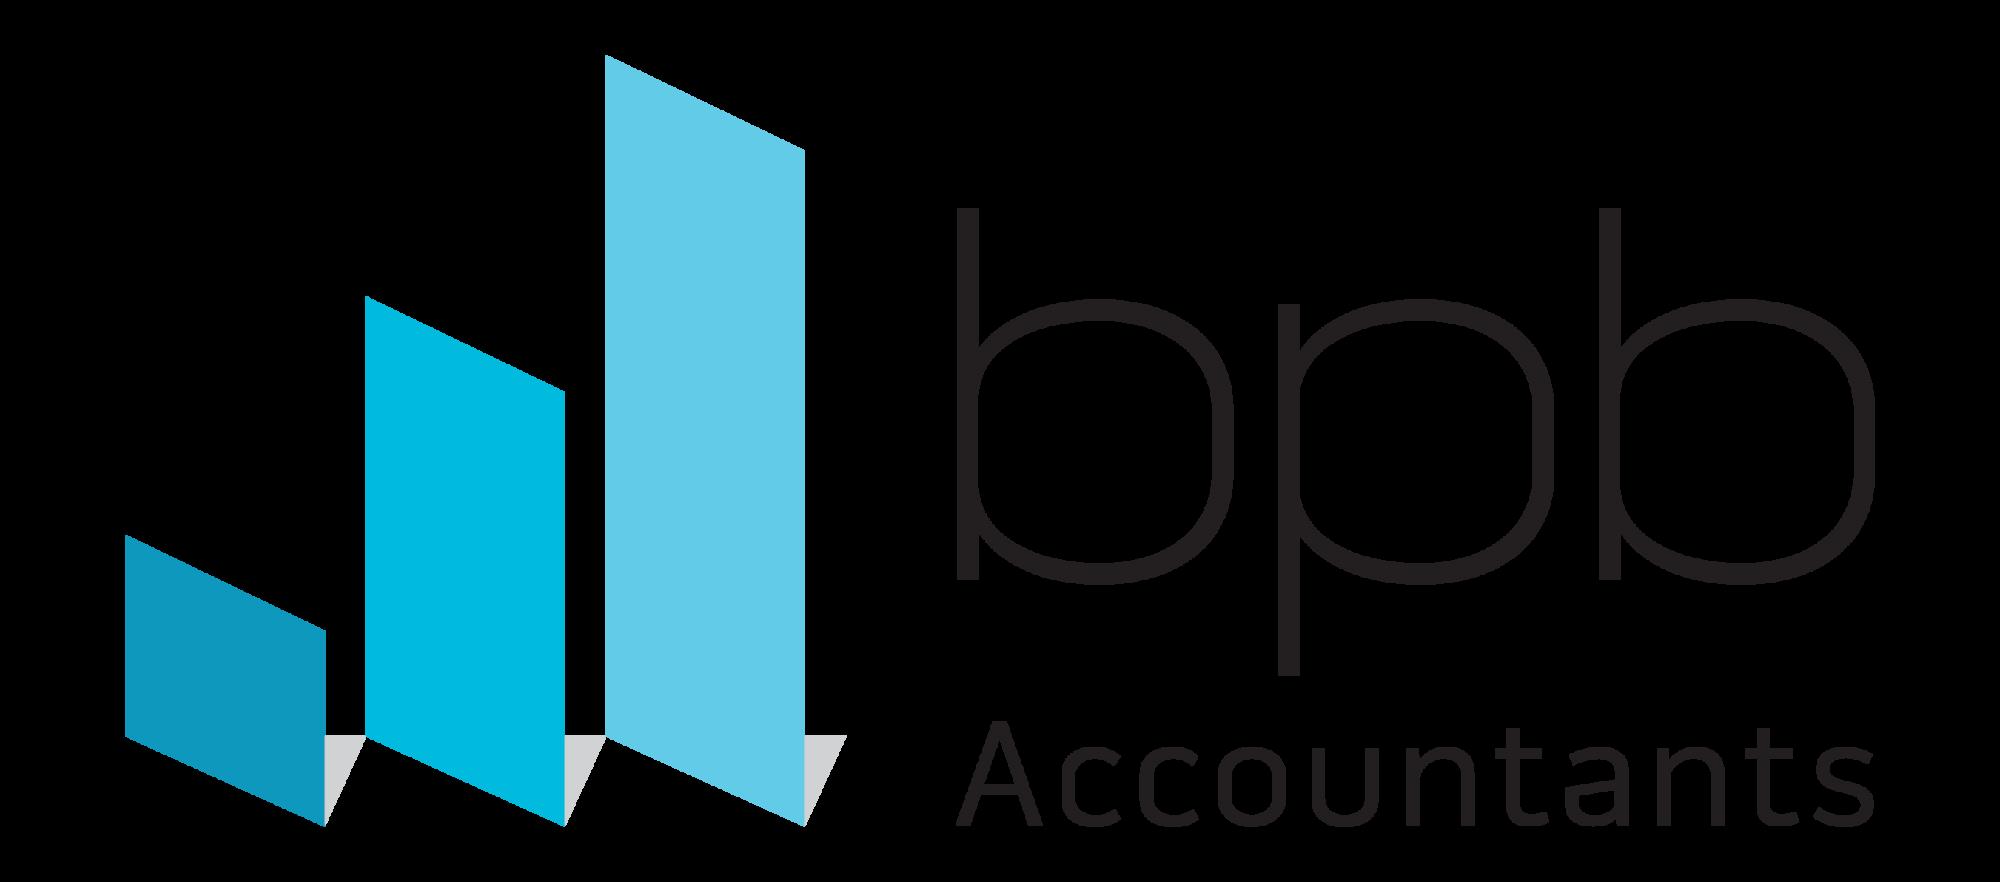 BPB Accountants /